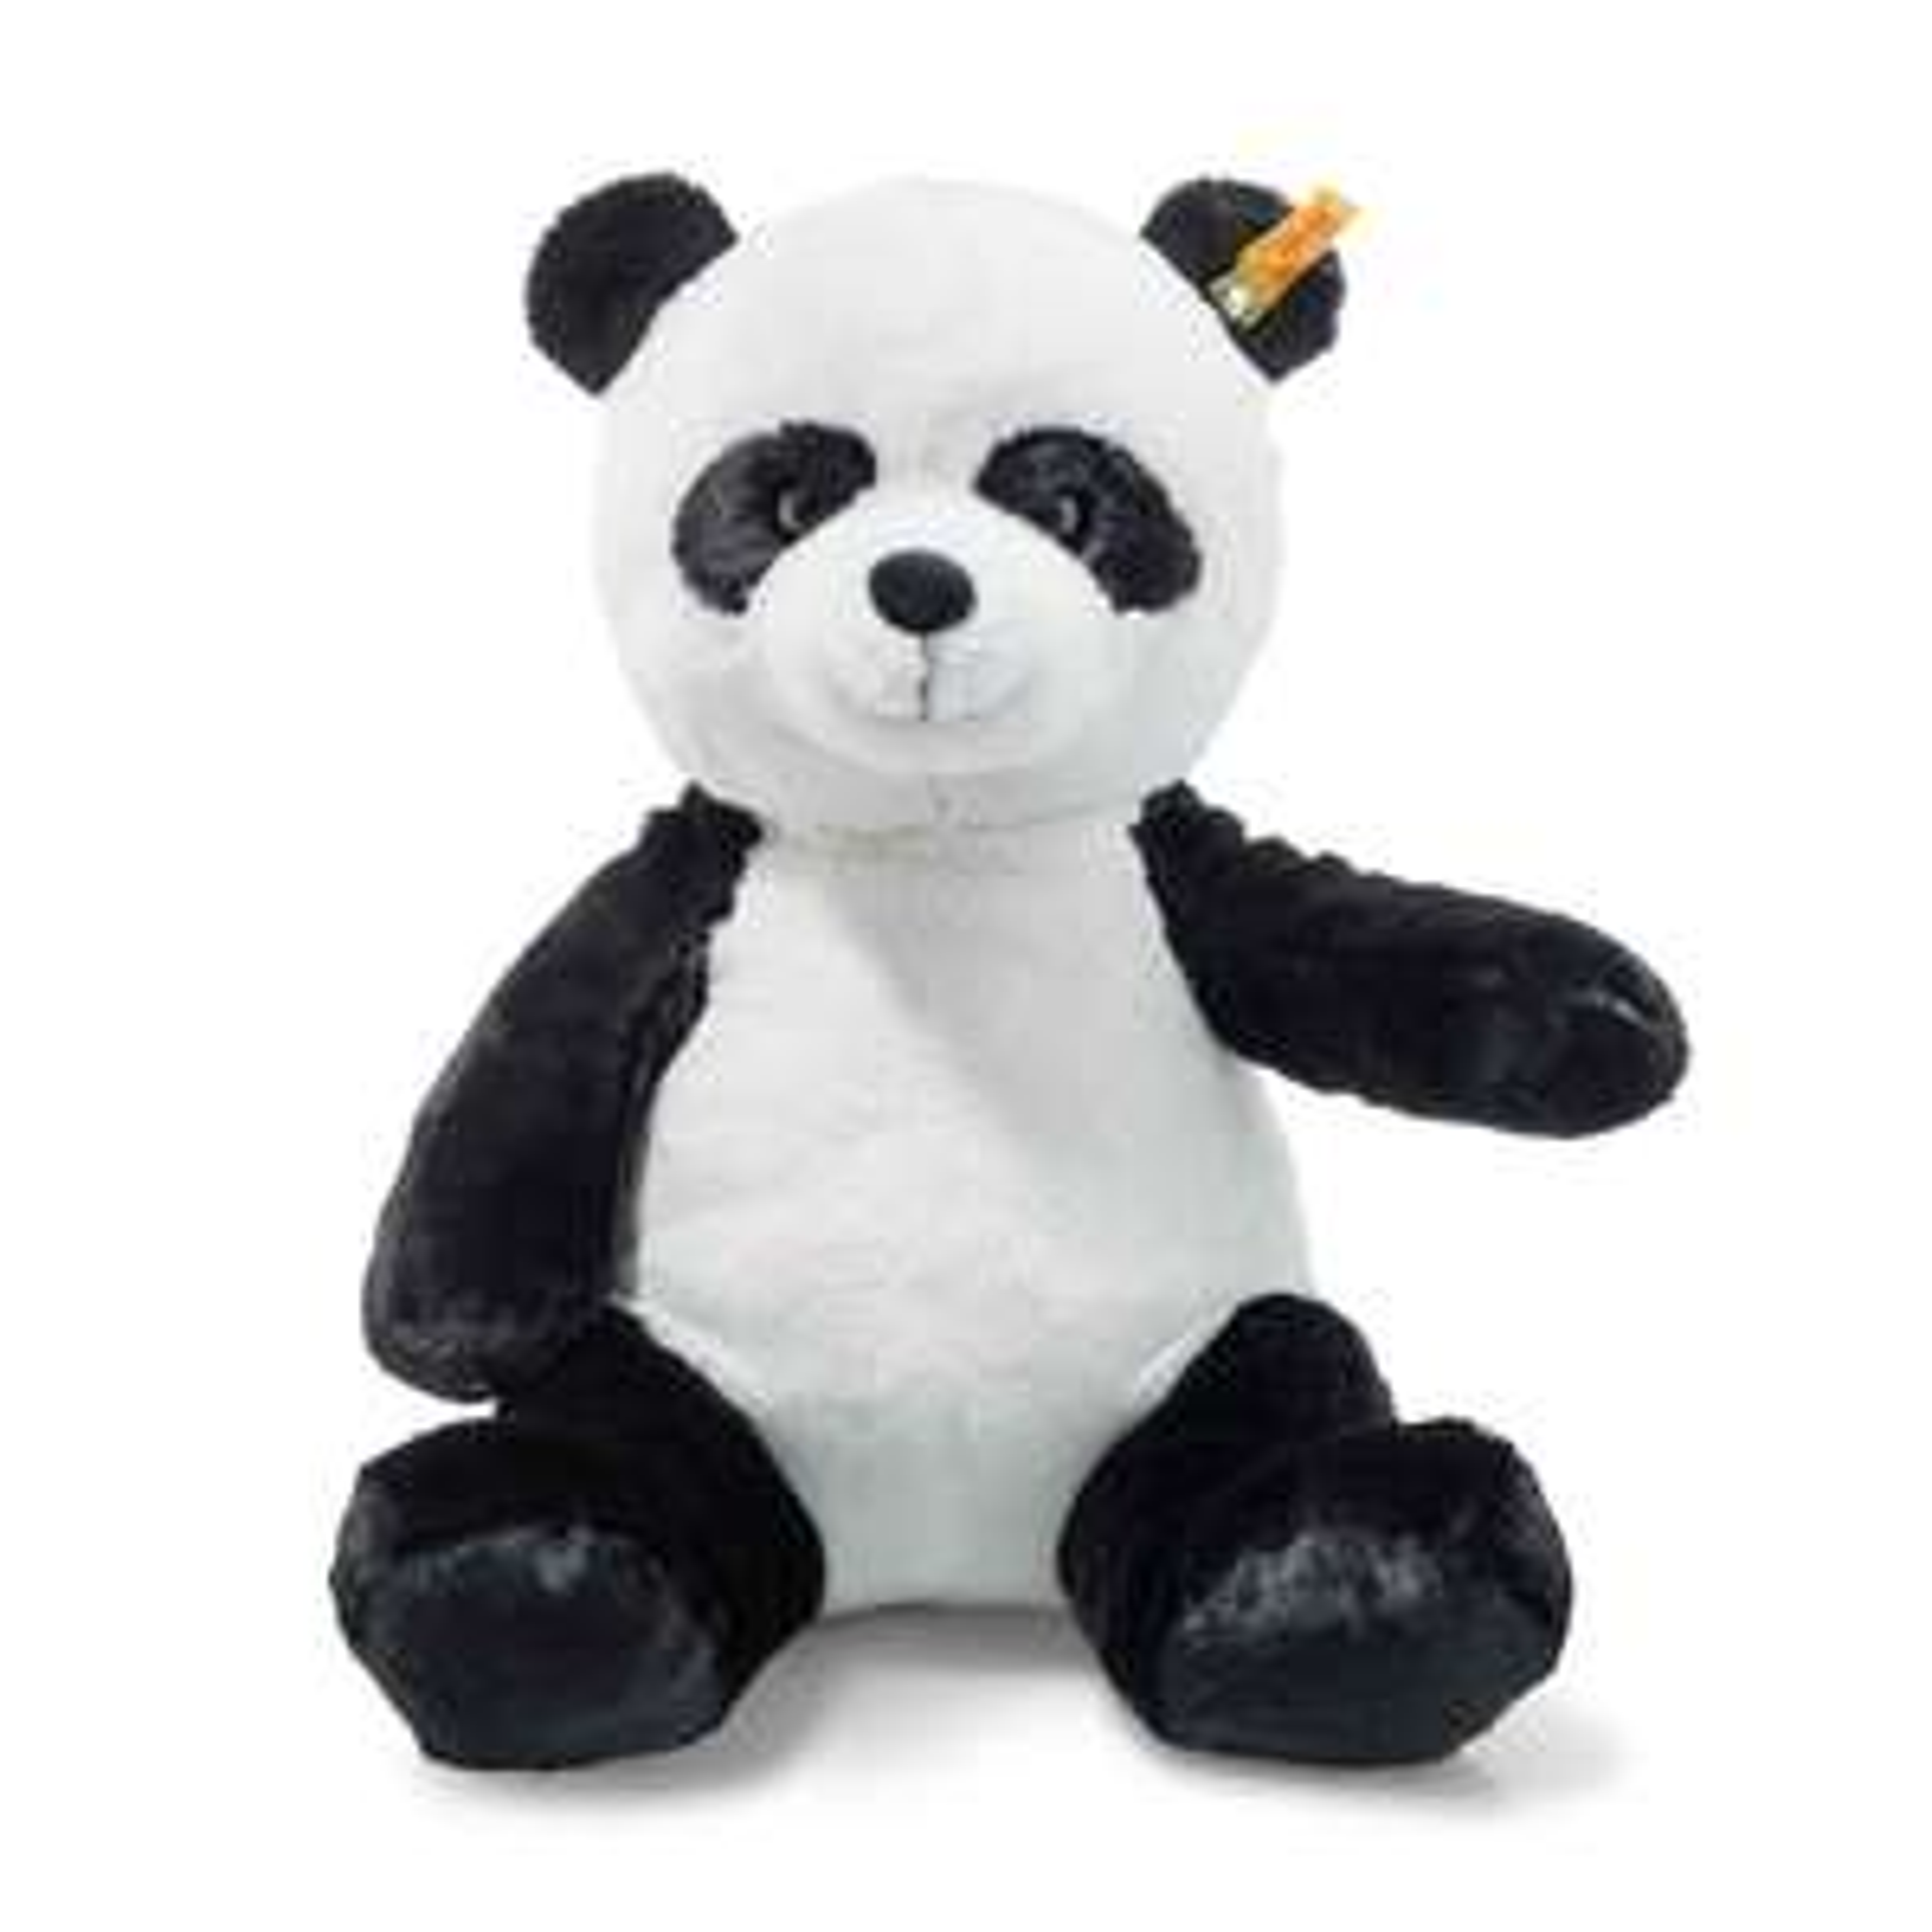 Steiff - Soft Cuddly Friends - Ming Panda - 38 cm Kuscheltier